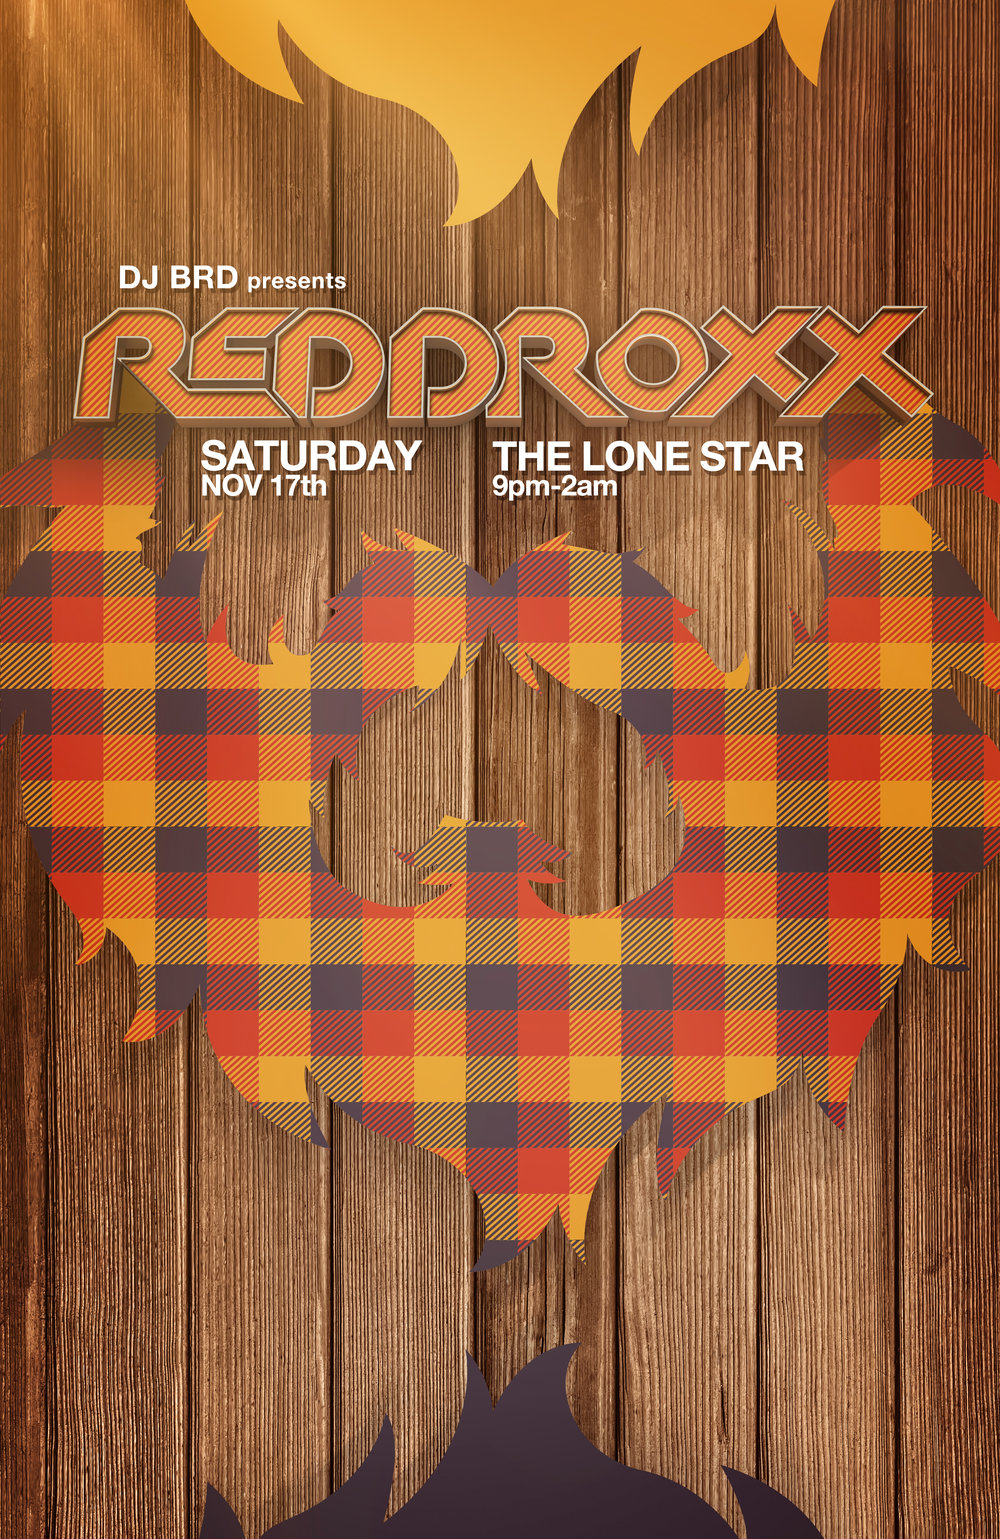 reddroxx_flyer80_11x17.jpg